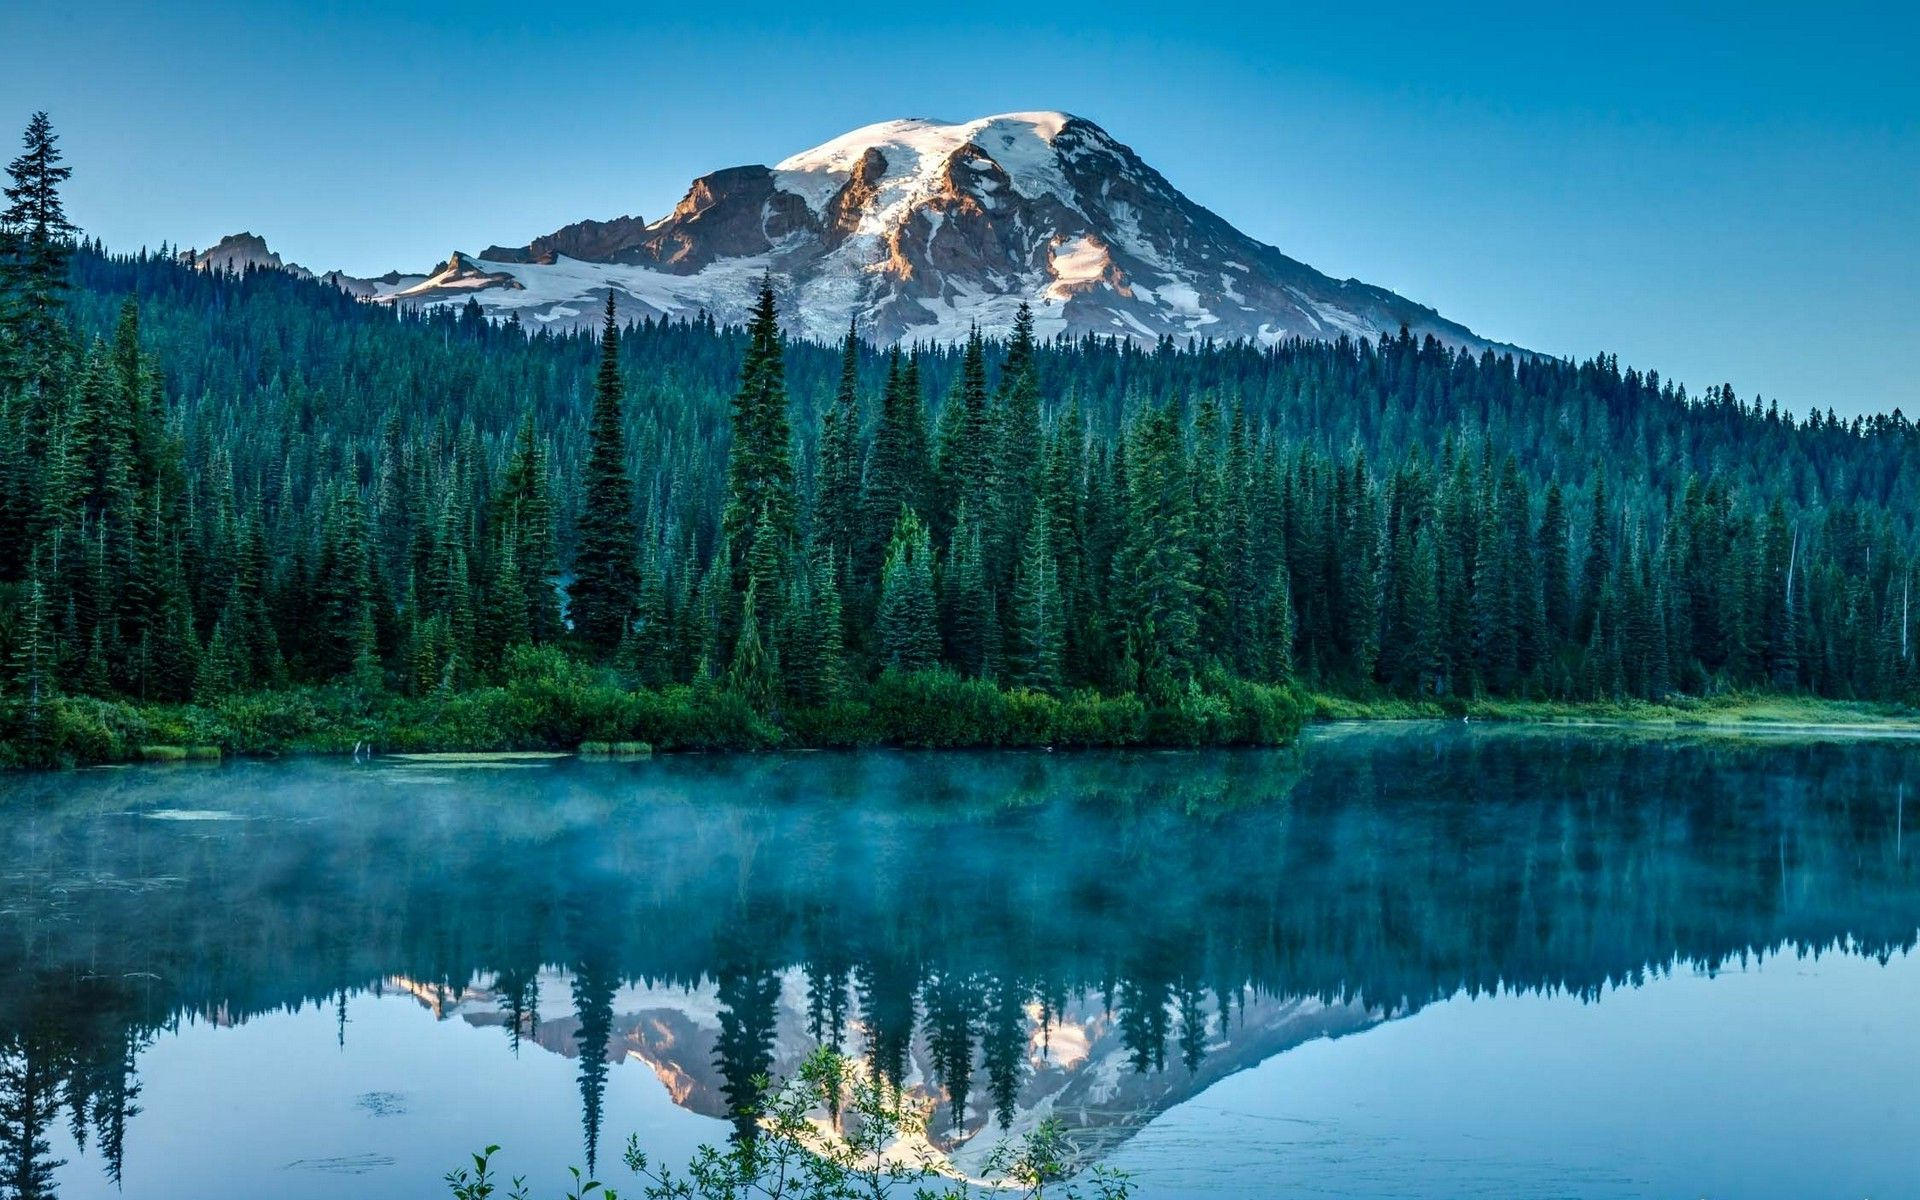 nature, Landscape, Lake, Forest, Snowy Peak, Morning